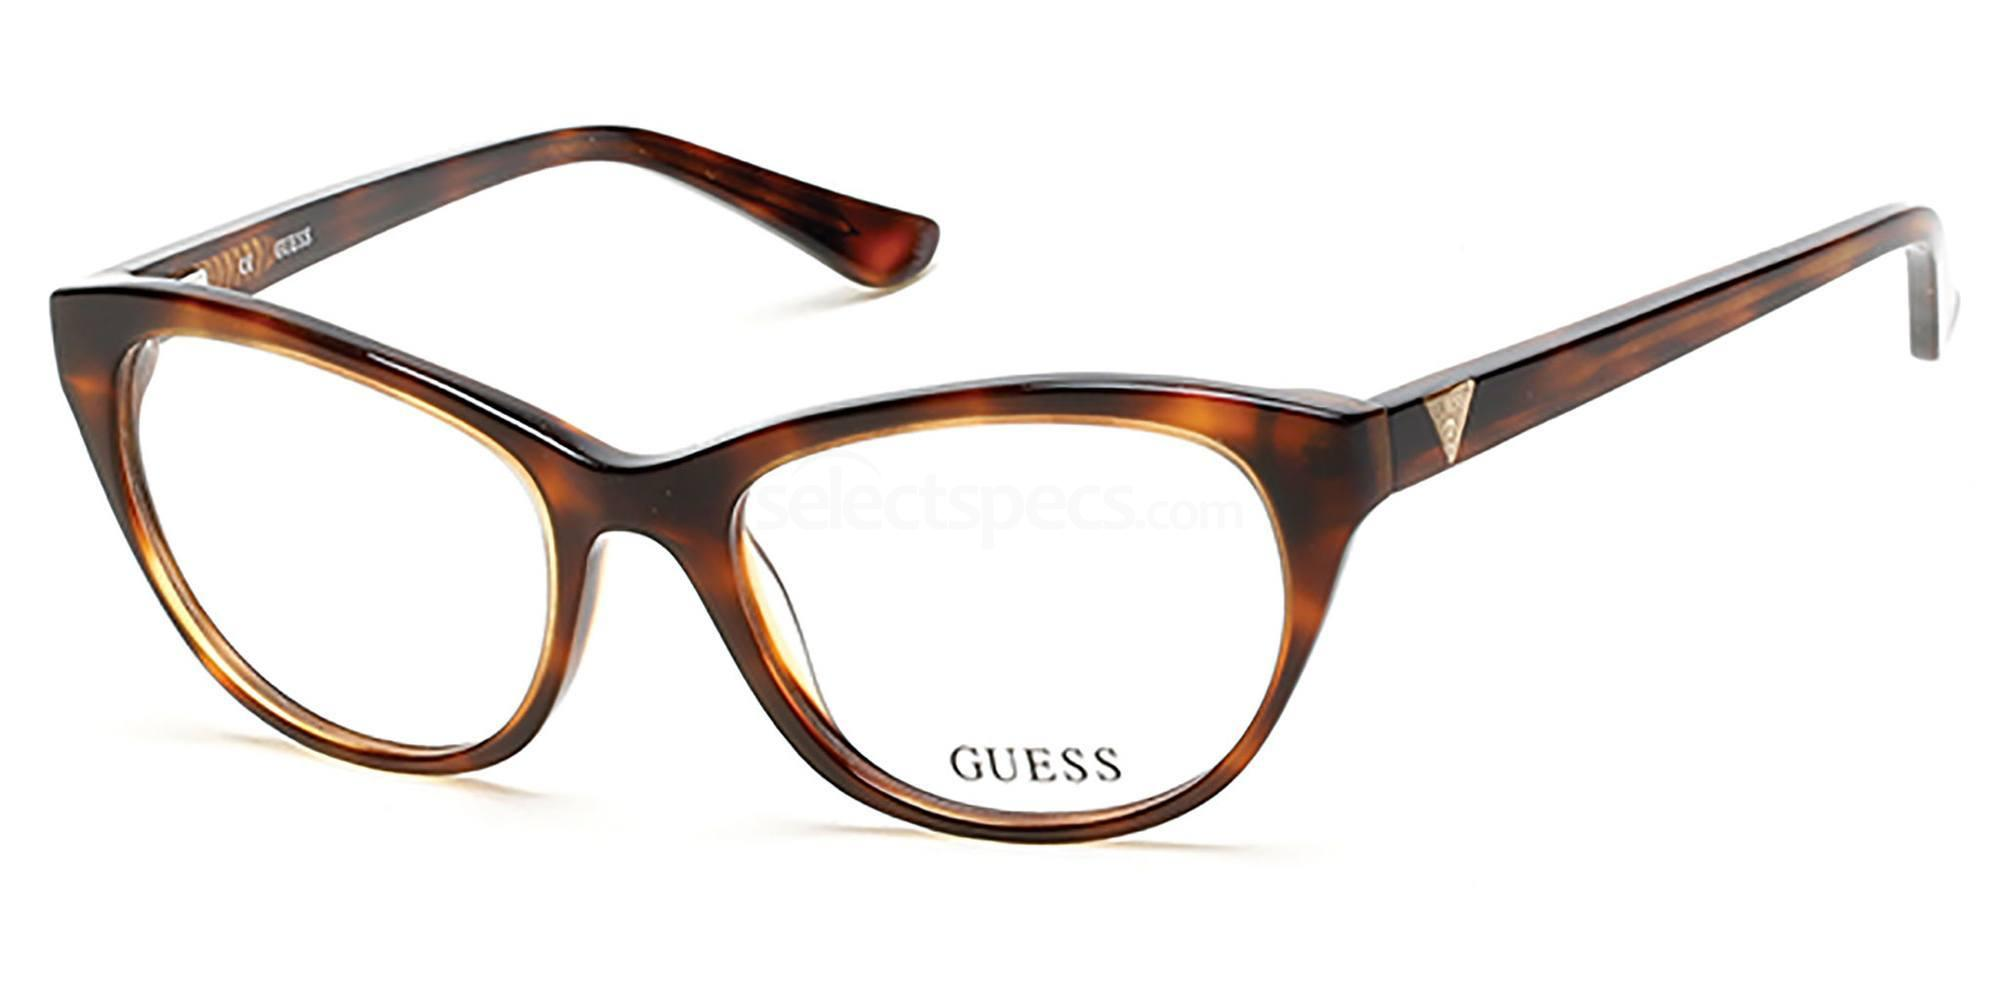 052 GU2529 Glasses, Guess